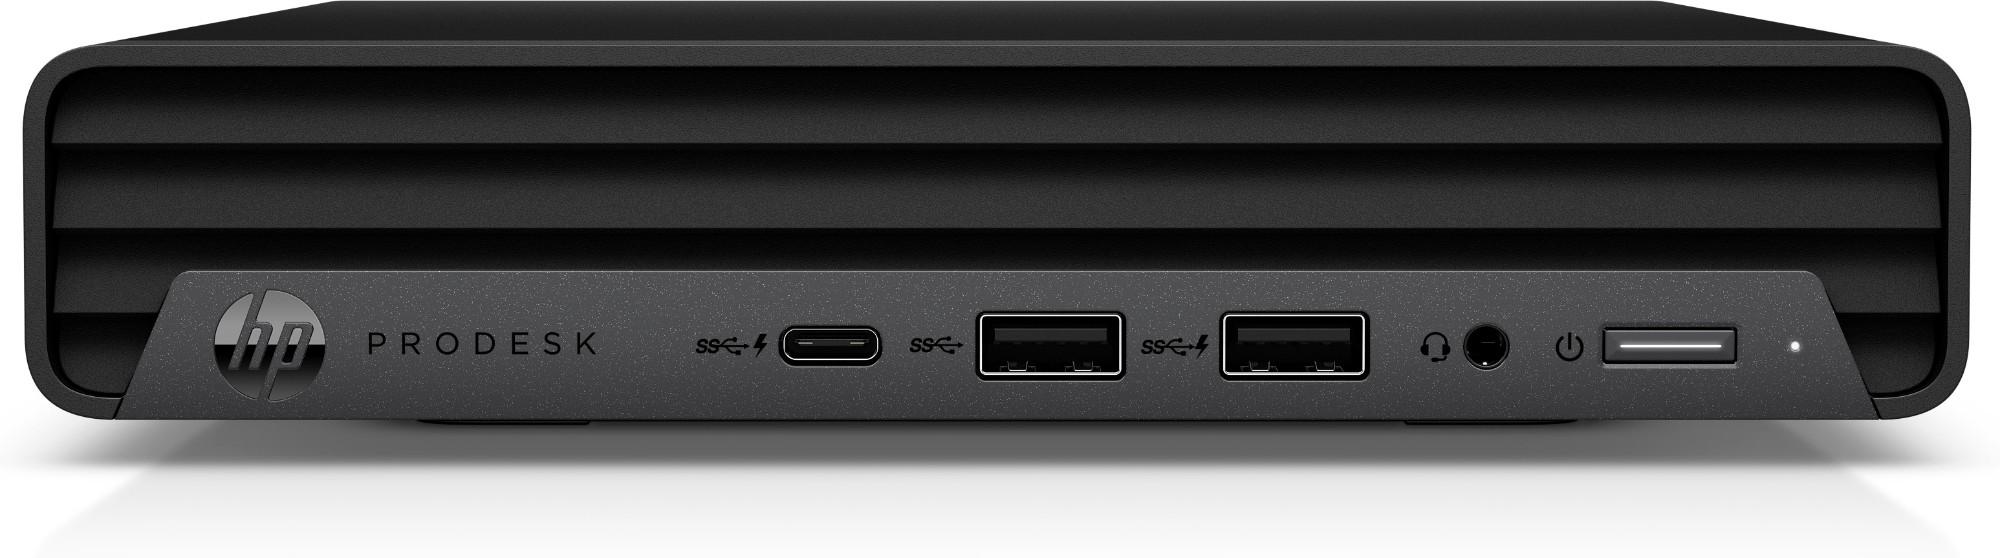 HP ProDesk 400 G6 Intel® Core™ i5 de 10ma Generación i5-10500T 8 GB DDR4-SDRAM 256 GB SSD mini PC Negro Windows 10 Pro